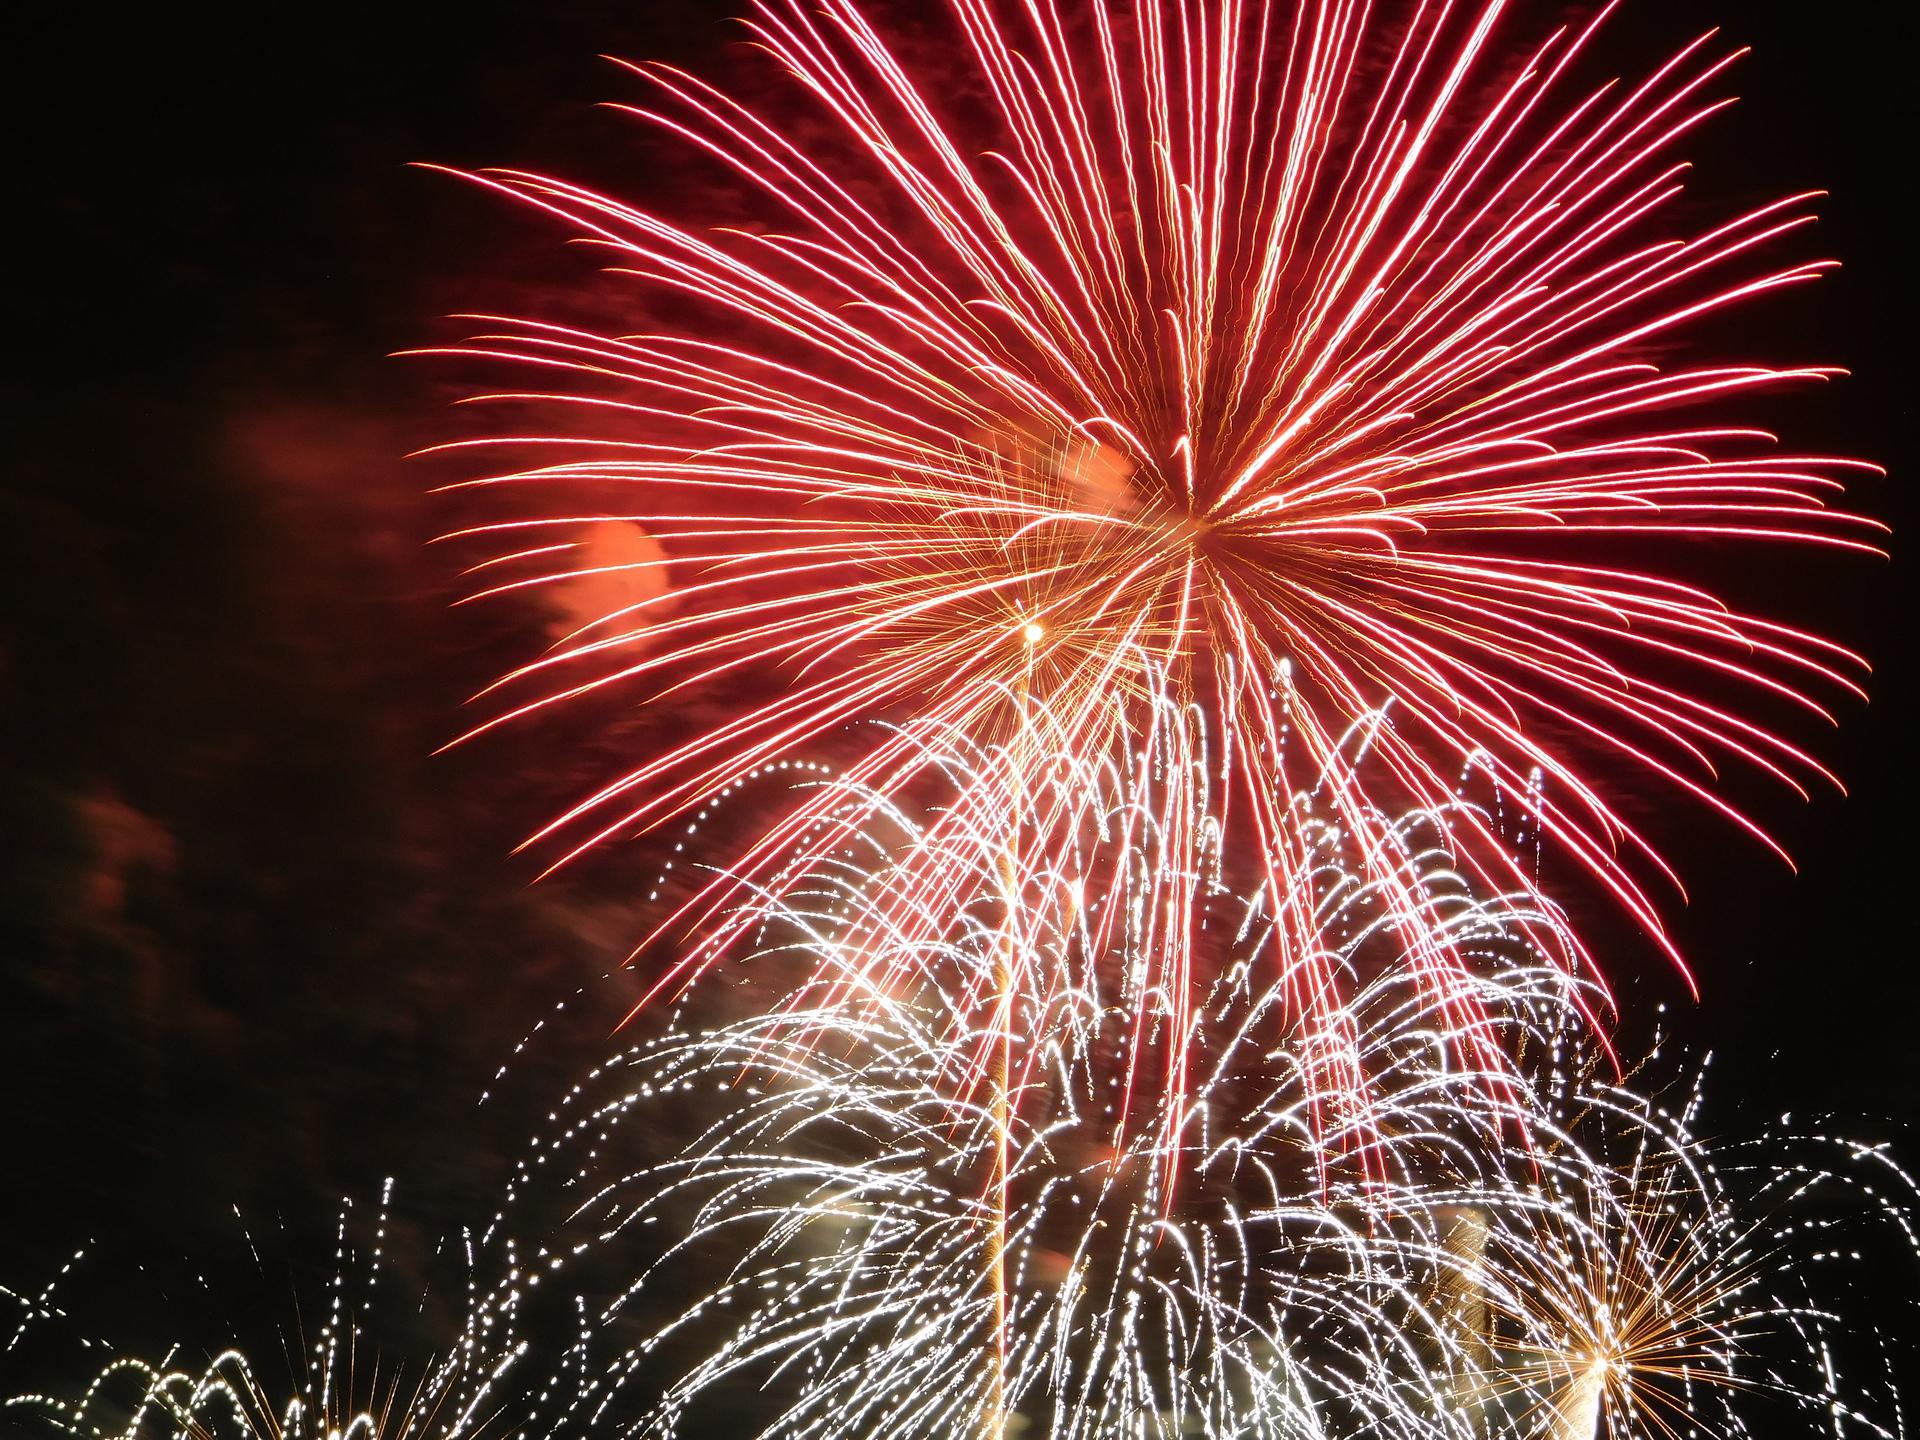 Fireworks | rick.cognyl.fournier, fireworks, no person, explosion